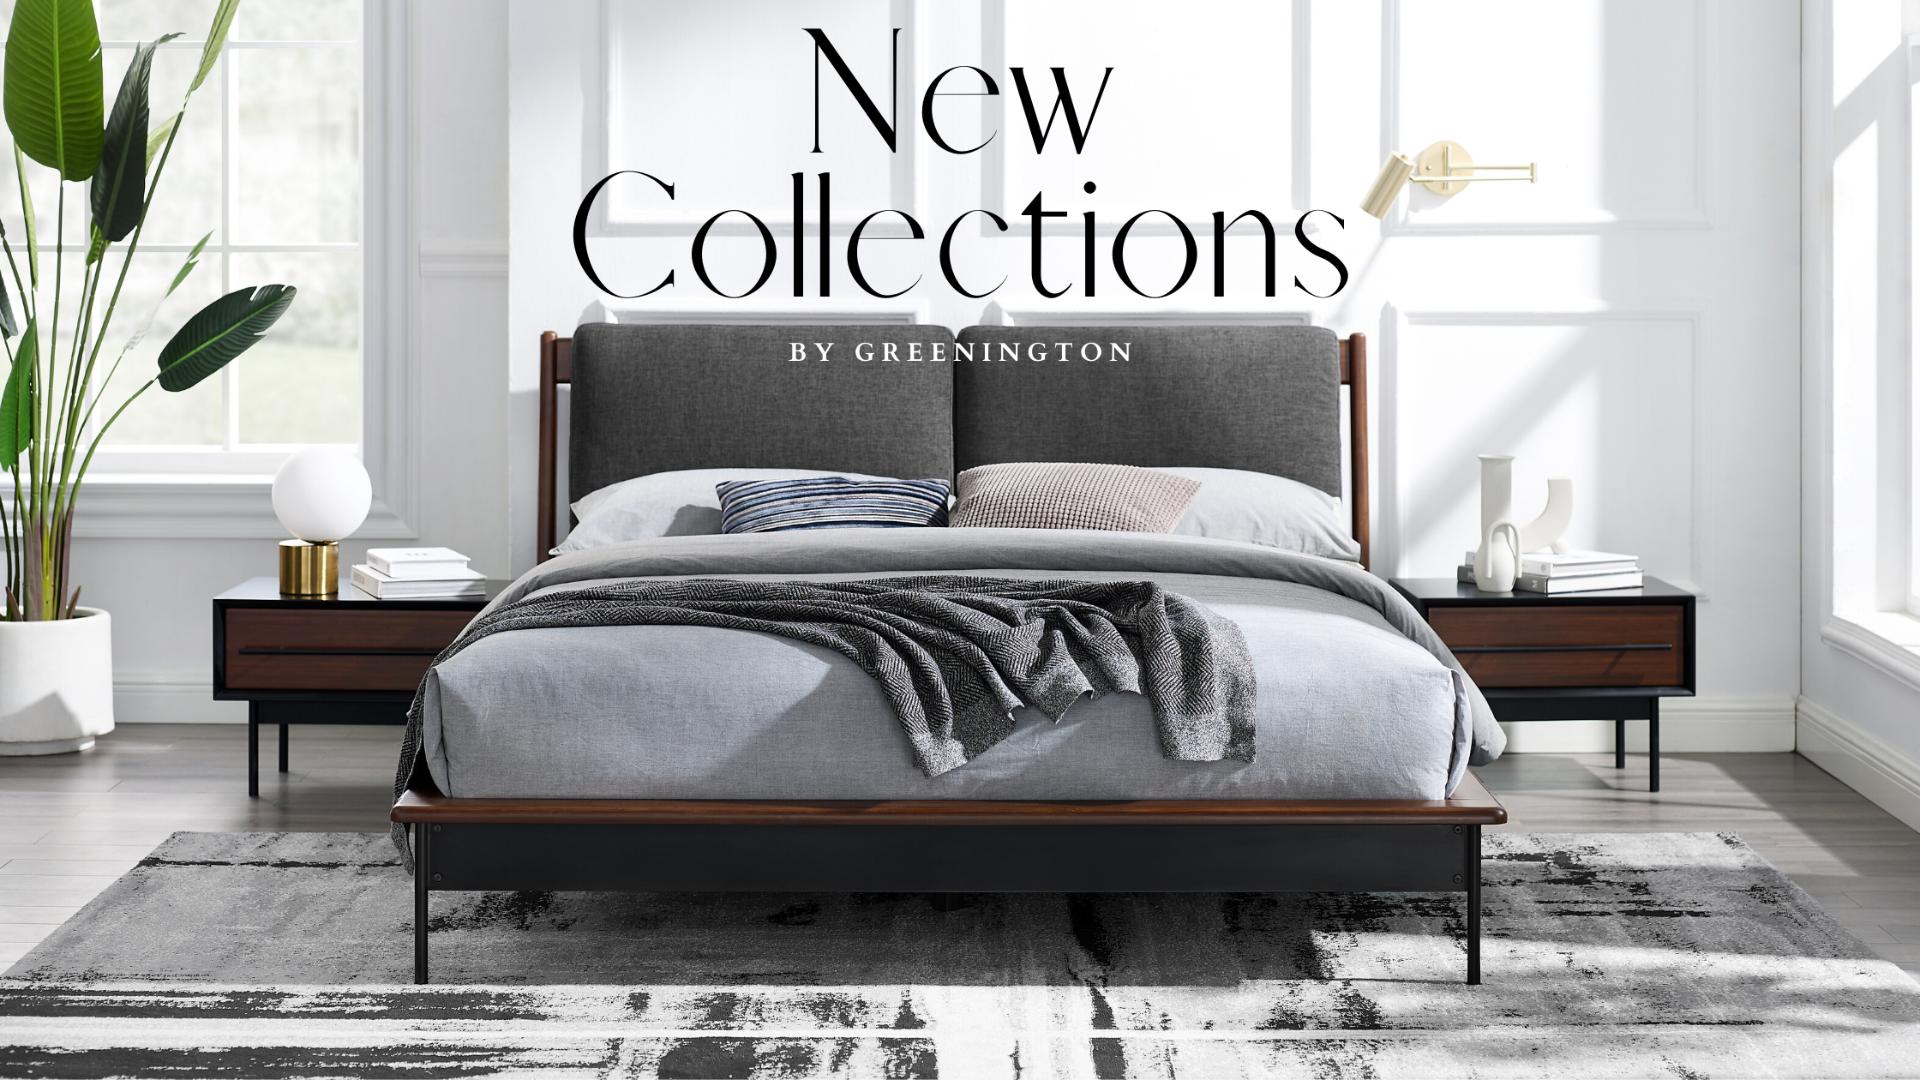 new greenington collections | haiku designs